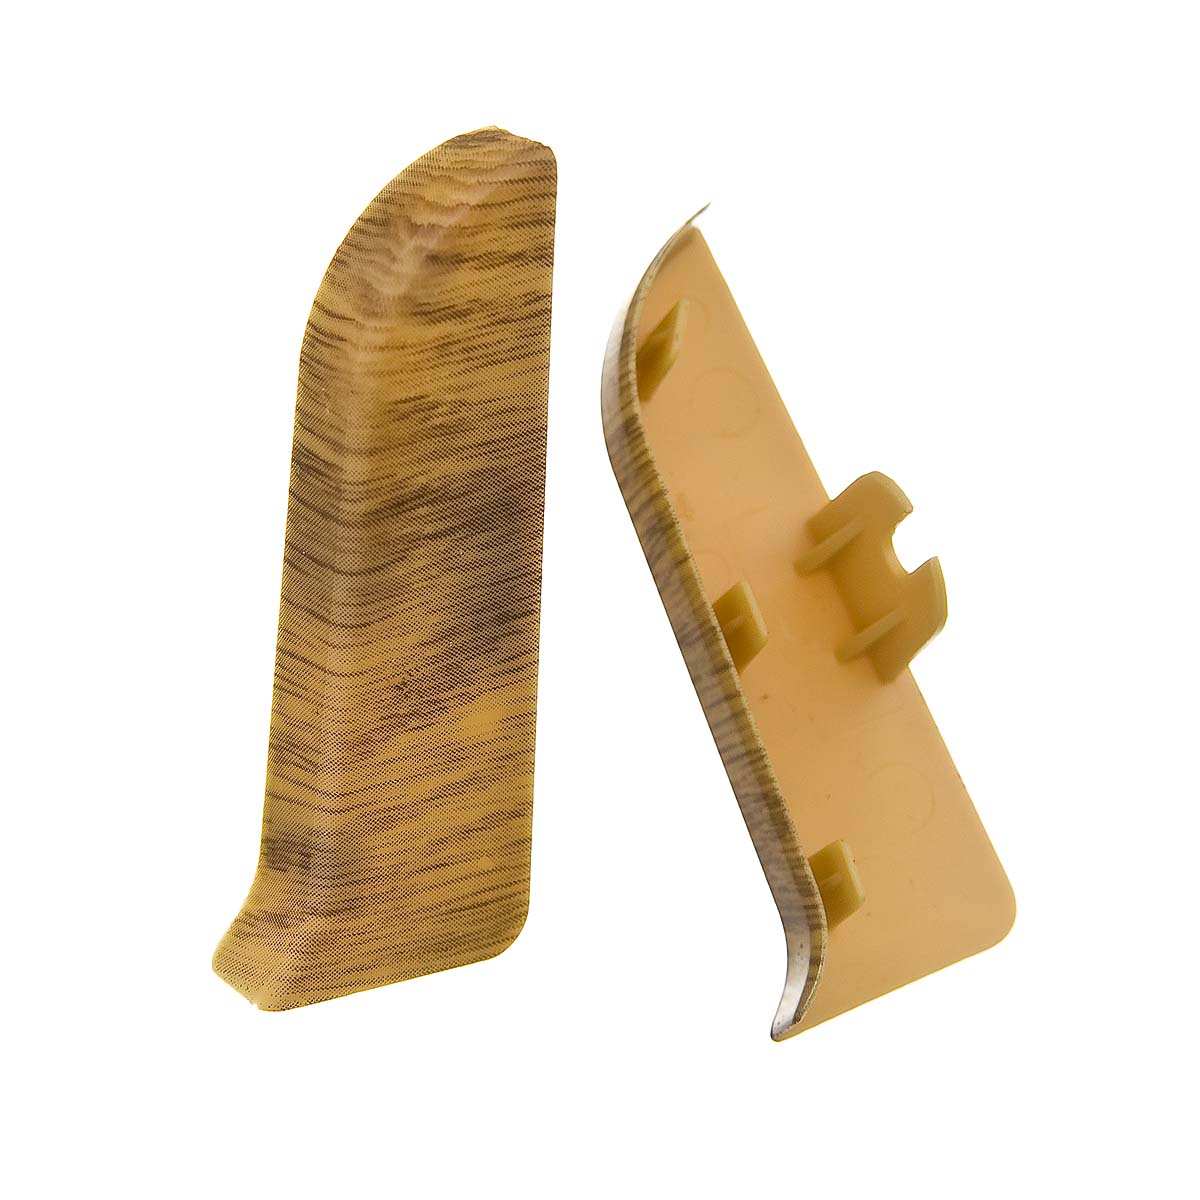 Заглушки торцевые (левая+правая) к плинтусу 68 мм дуб арденский Nexus